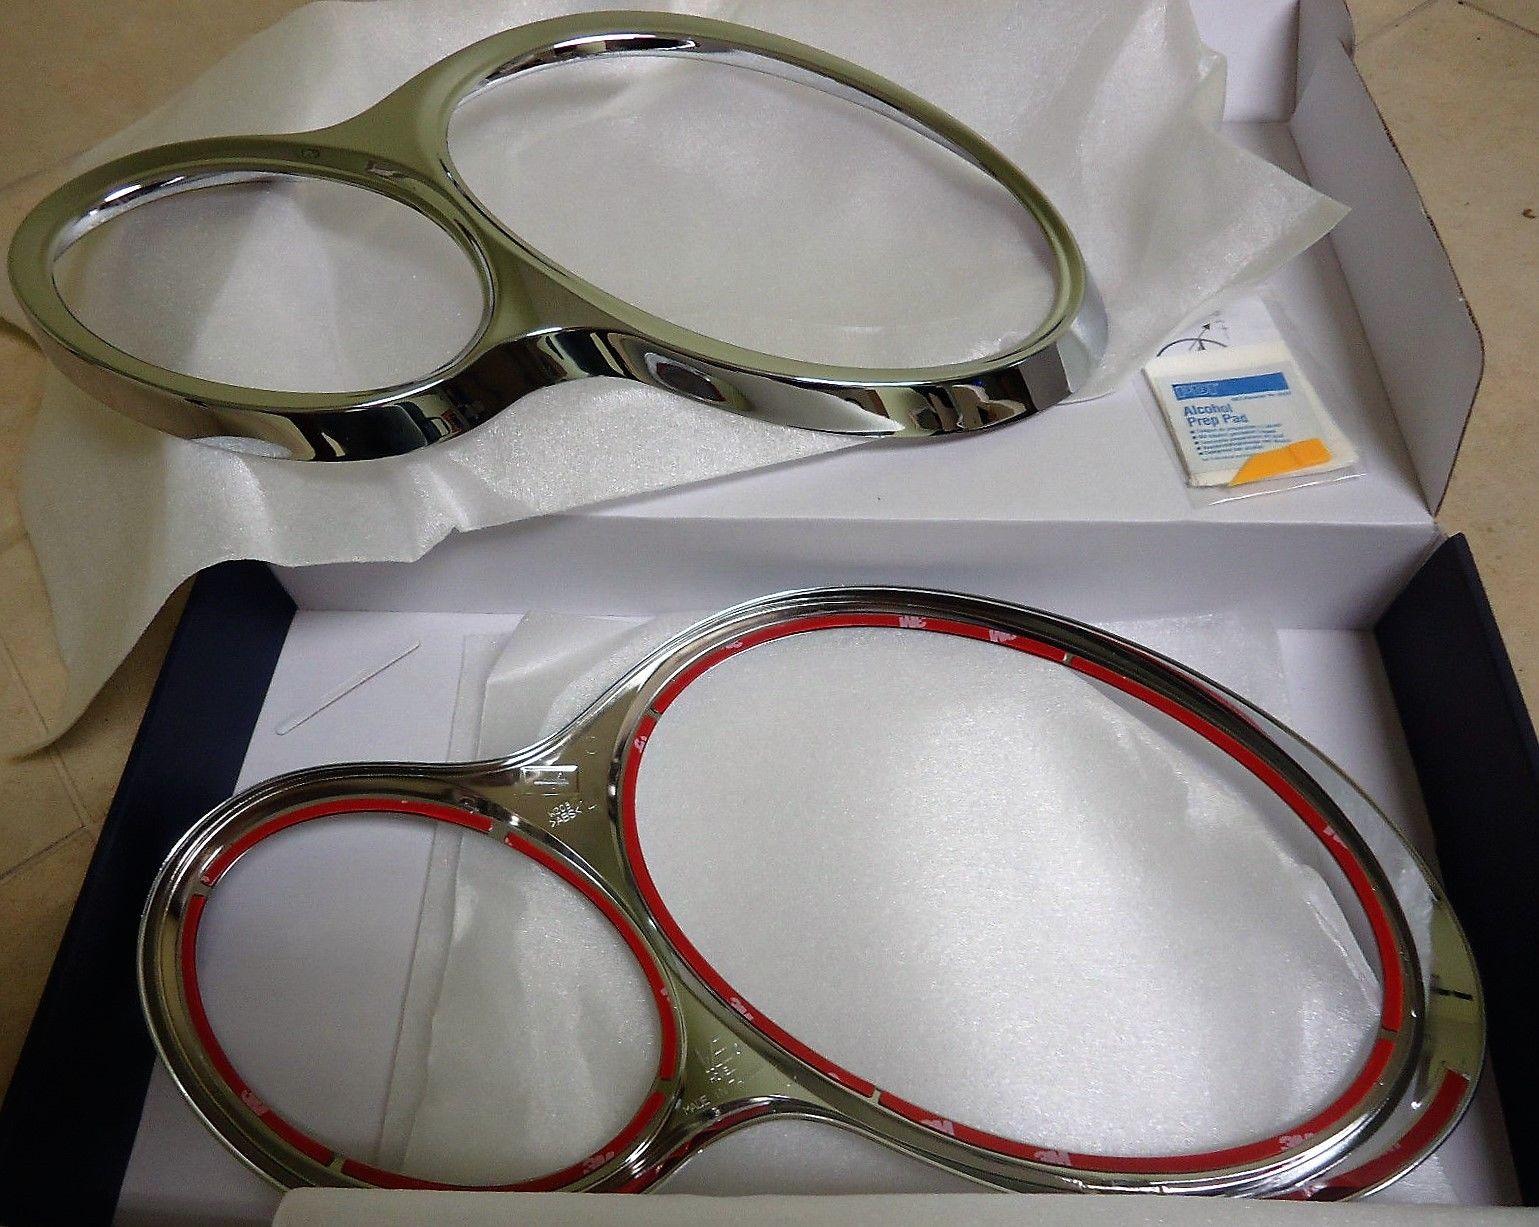 2000-2007 MERCEDES  W203 SEDAN CHROME HEAD LAMP RIM RINGS SET 2002-2003-04-05-06